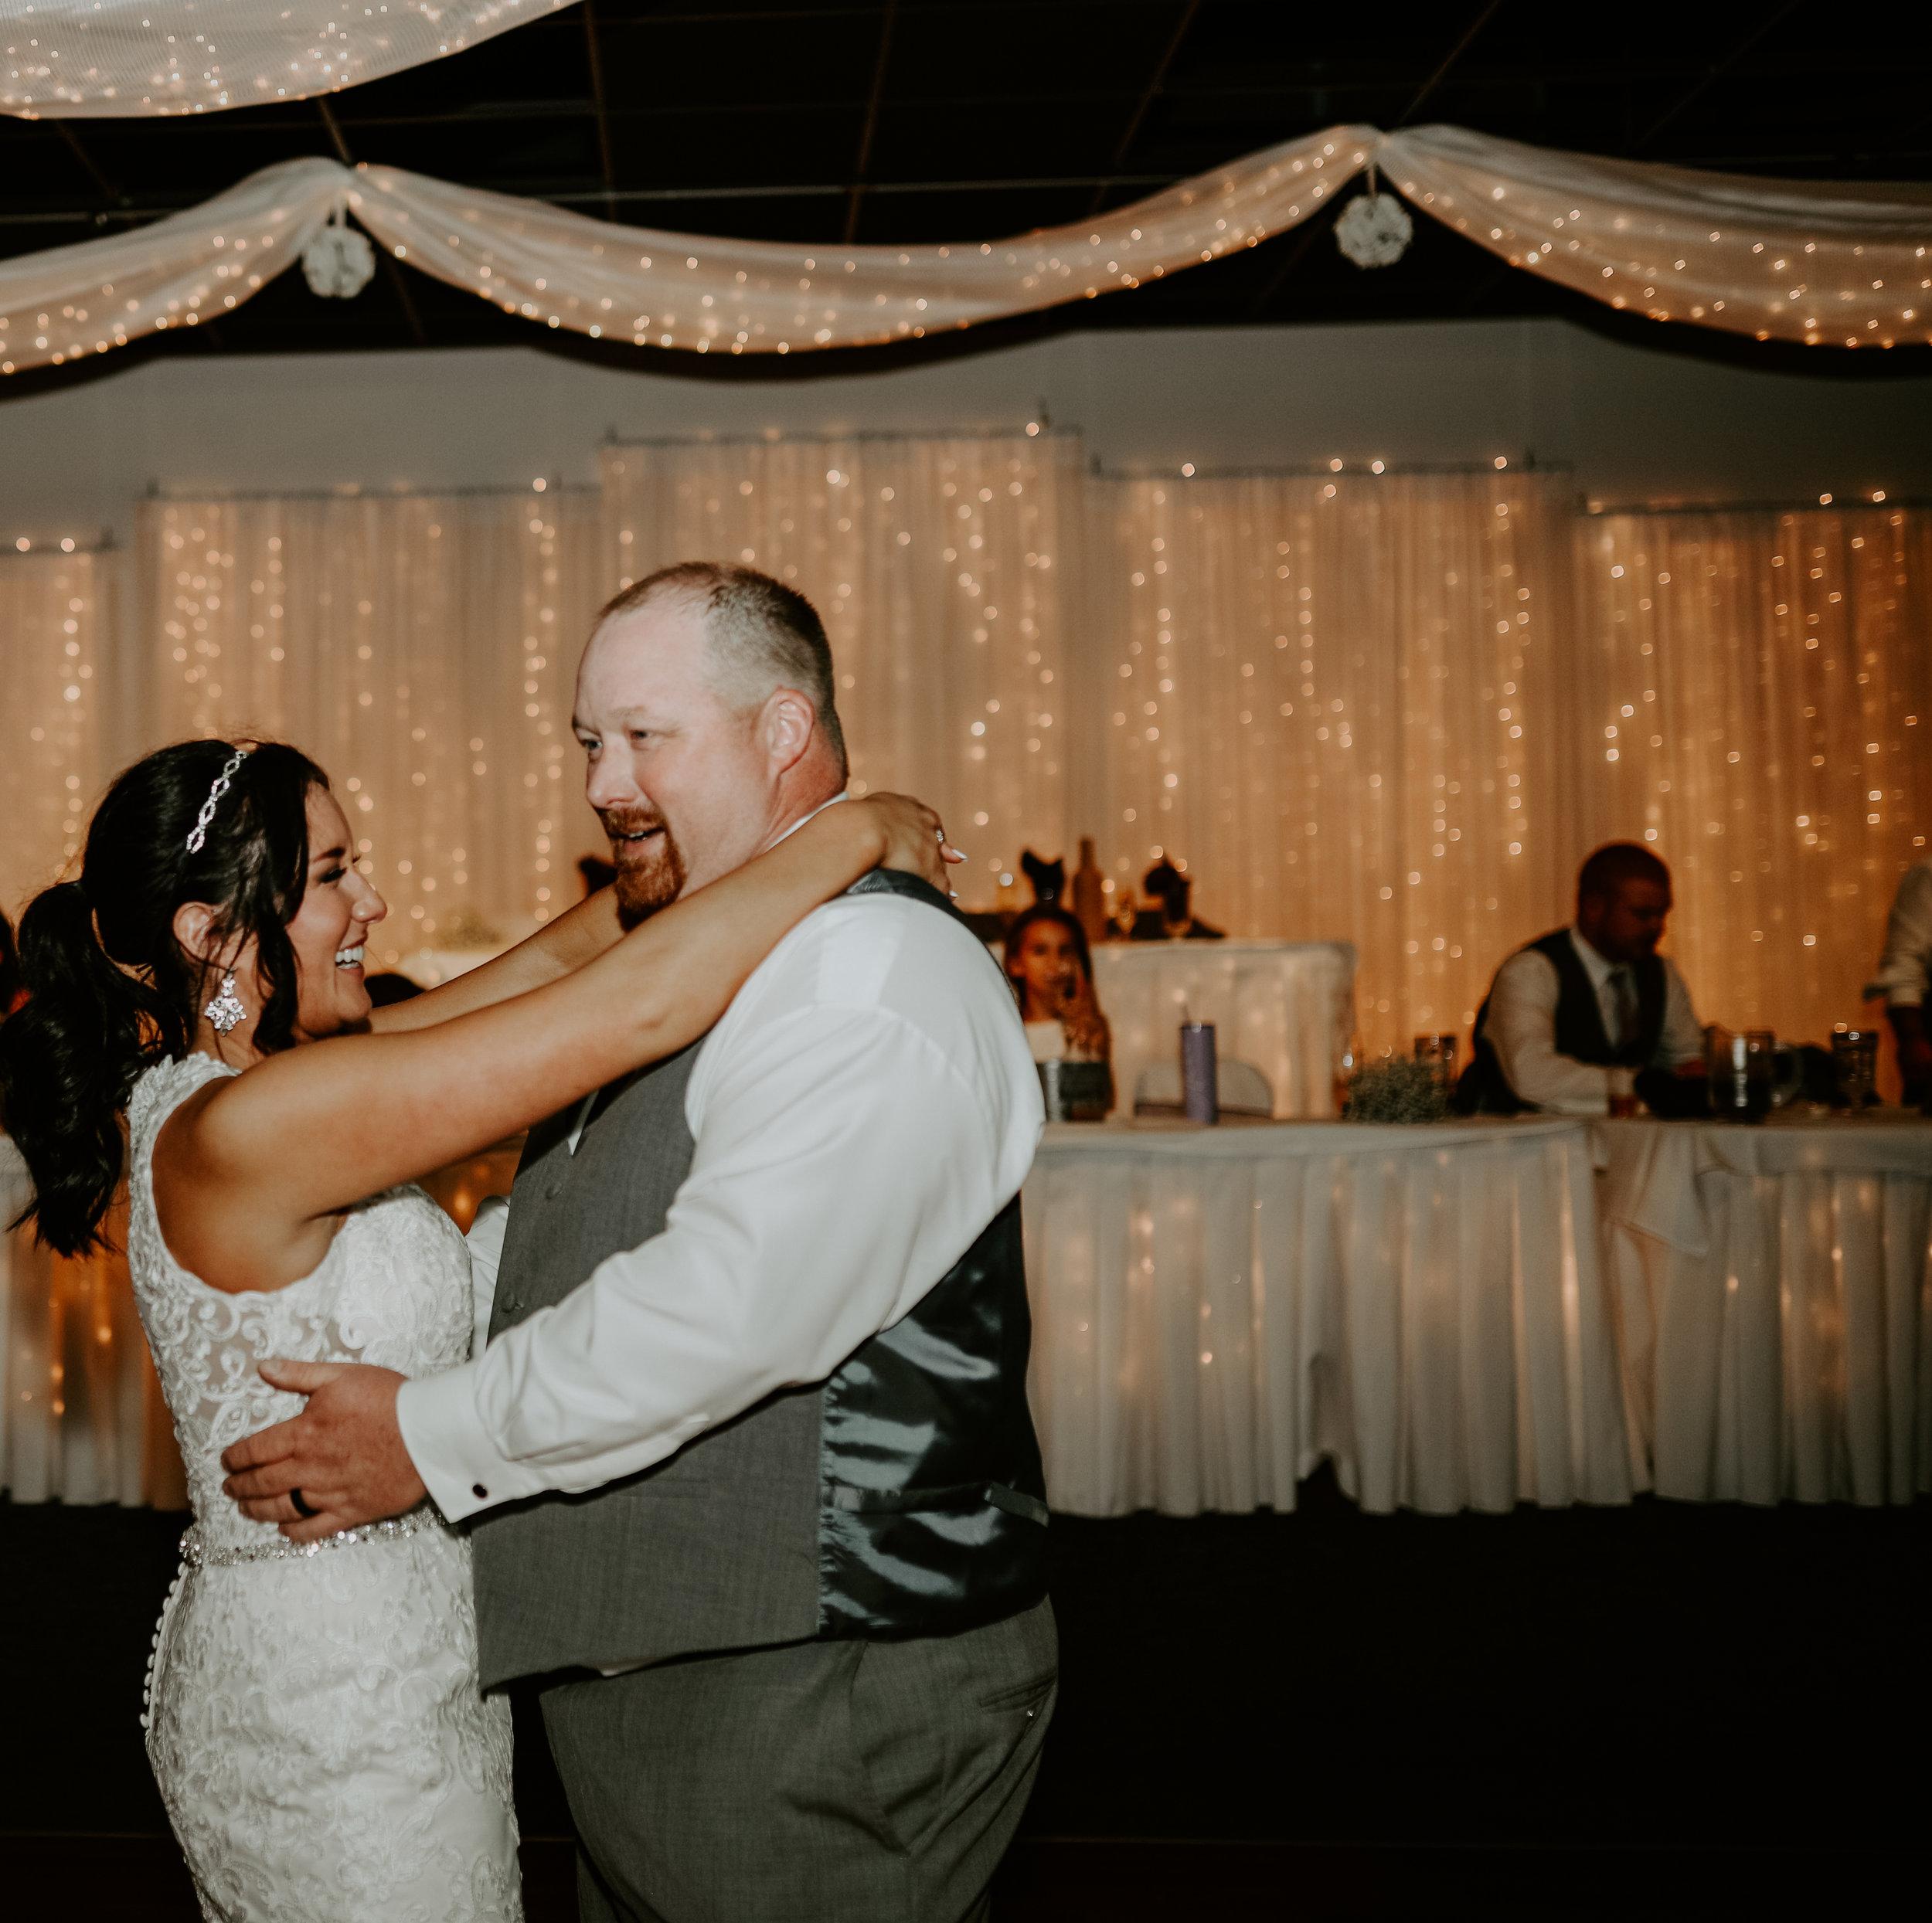 Kylei + Jordan wedding 389 (1 of 1).jpg